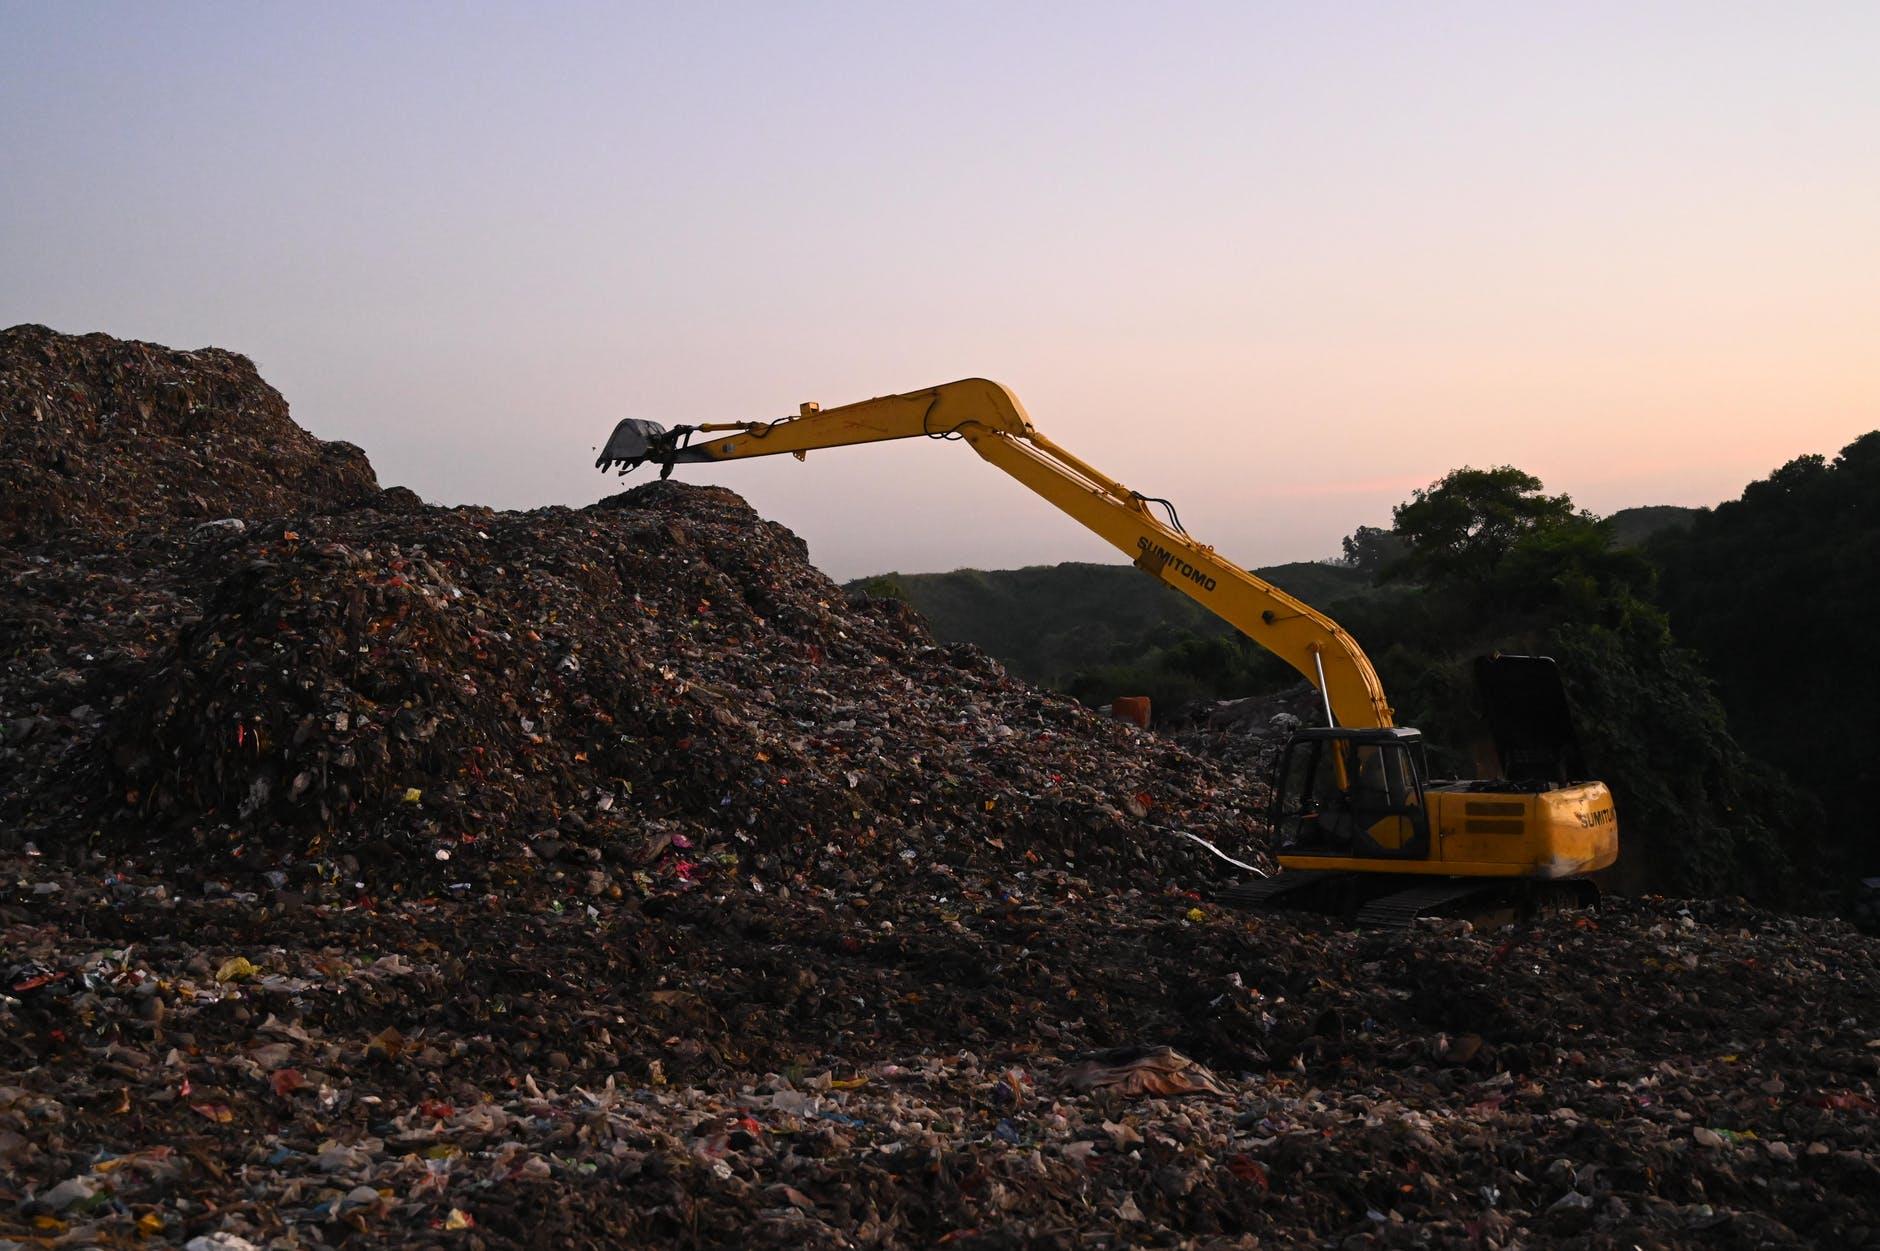 photo of backhoe on landfill